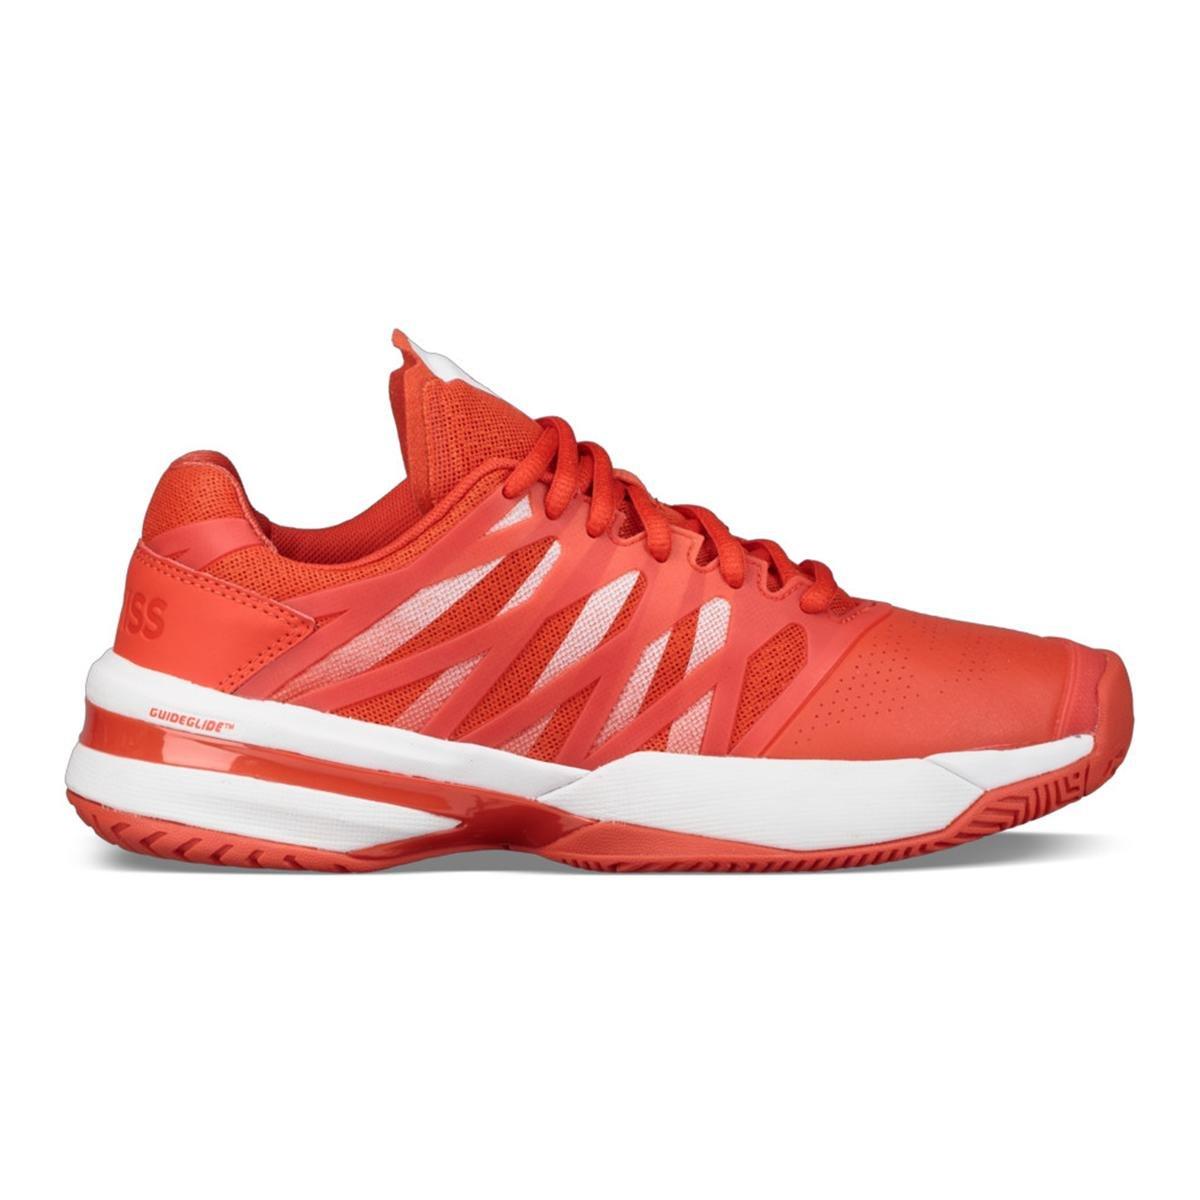 K-Swiss Women's Hypercourt Express Tennis Shoe, Fiesta/White (7.5 US)